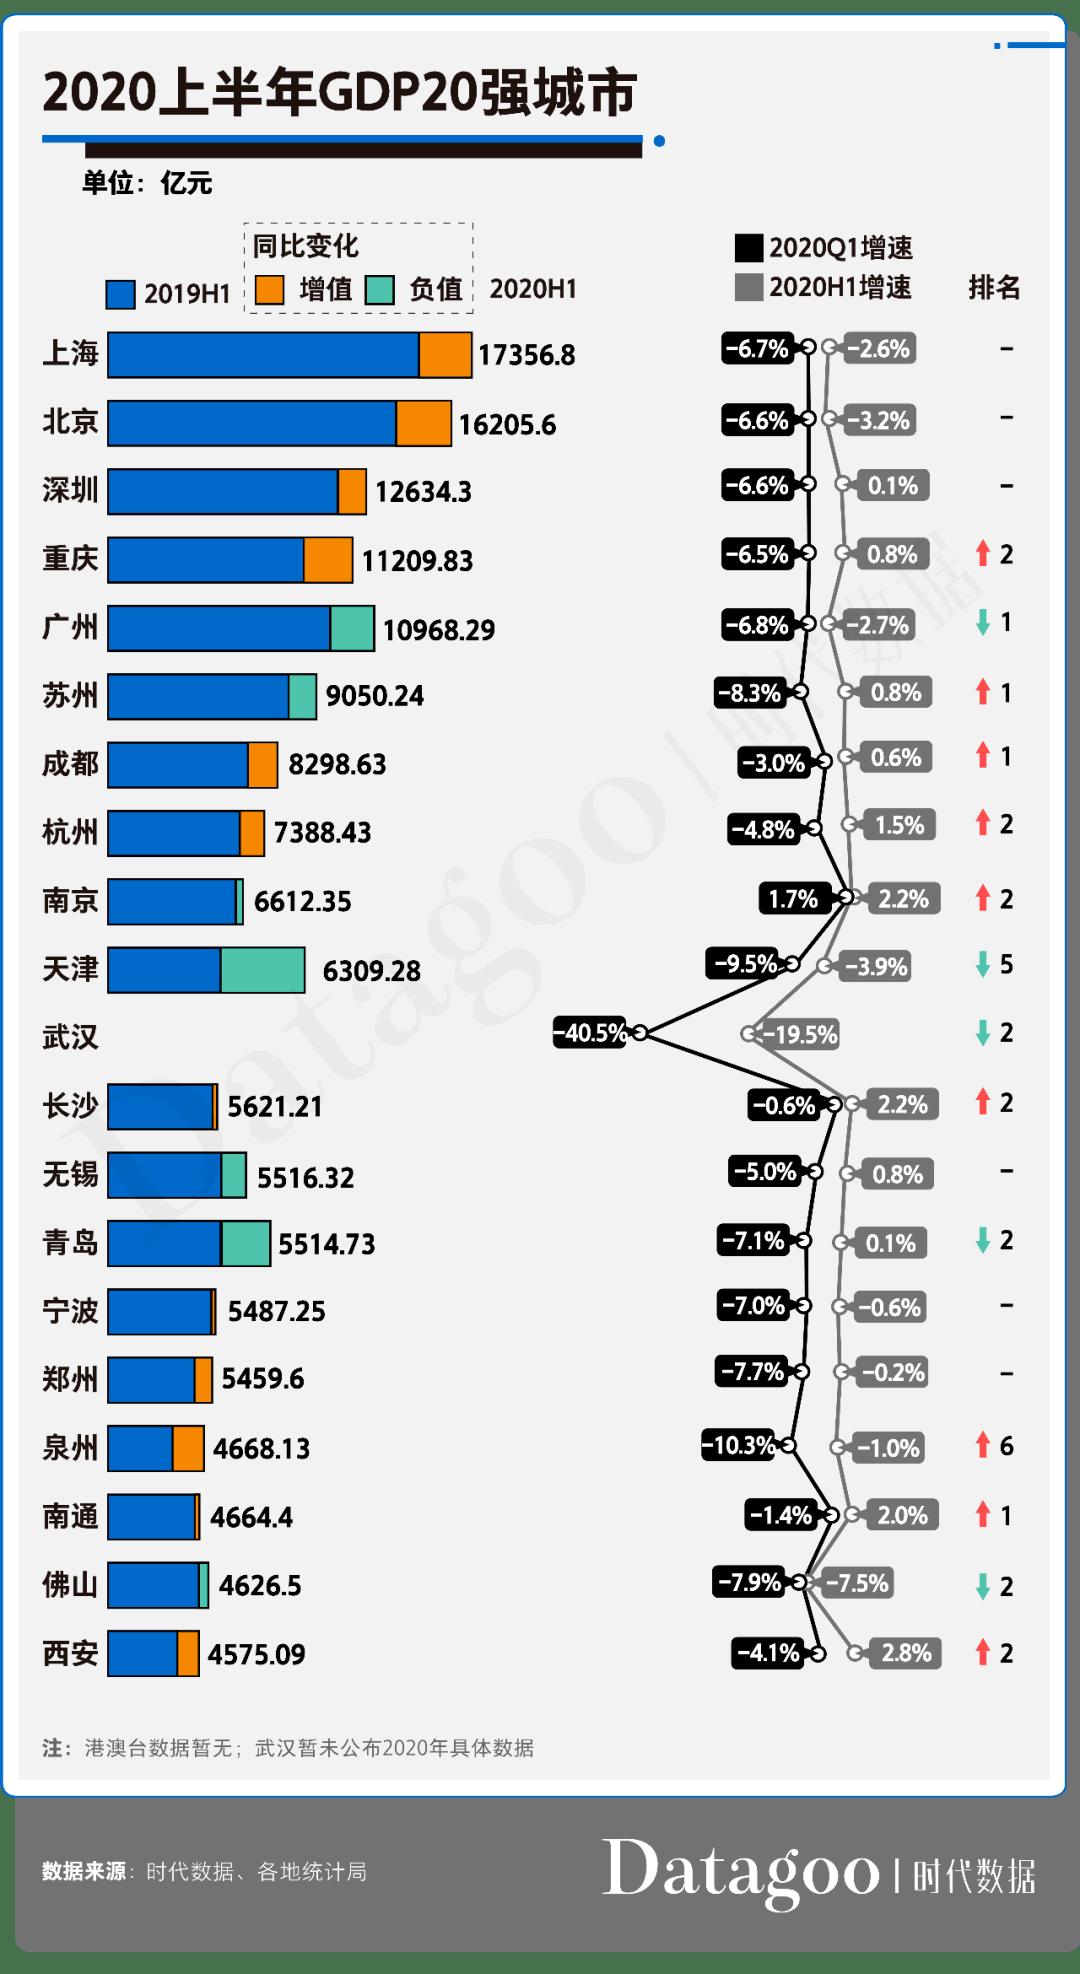 2020各城市gdp排名_中国城市gdp排名2020